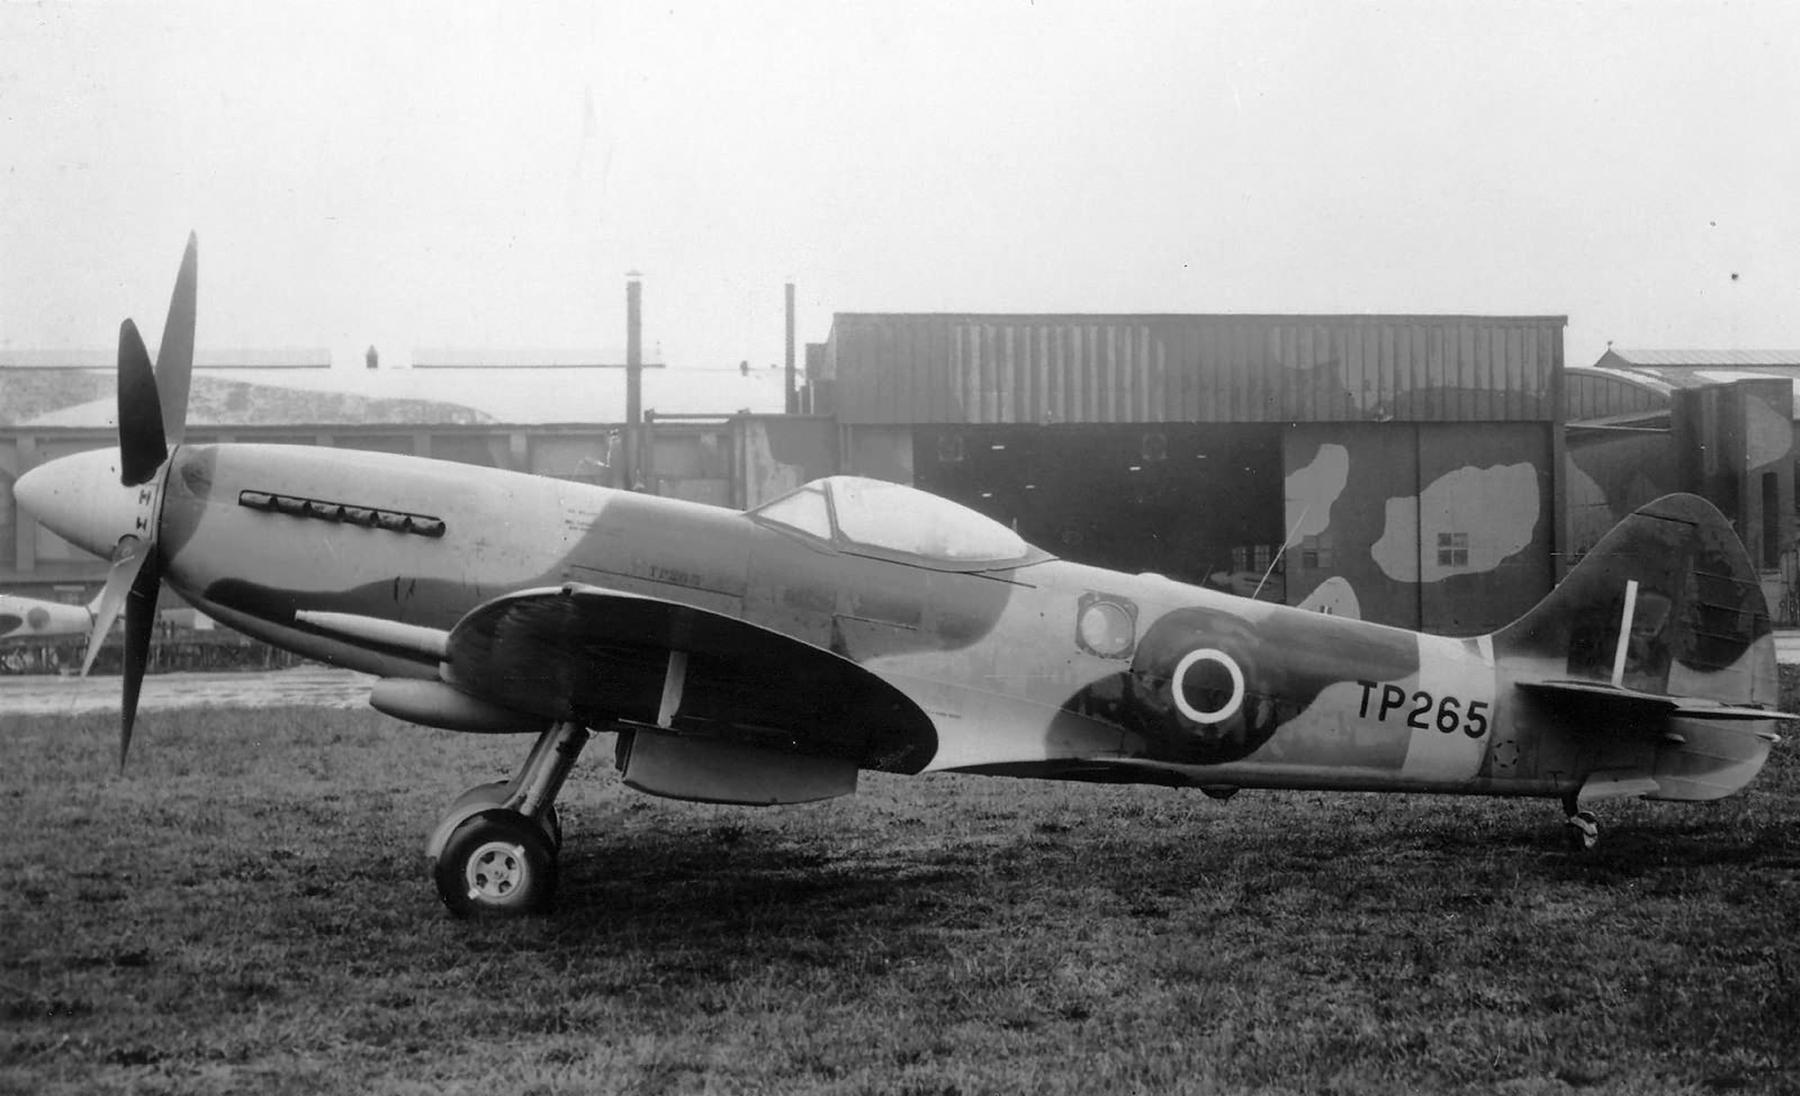 Spitfire FR18 RAF TP265 reconnaissance variant on the ground web 01